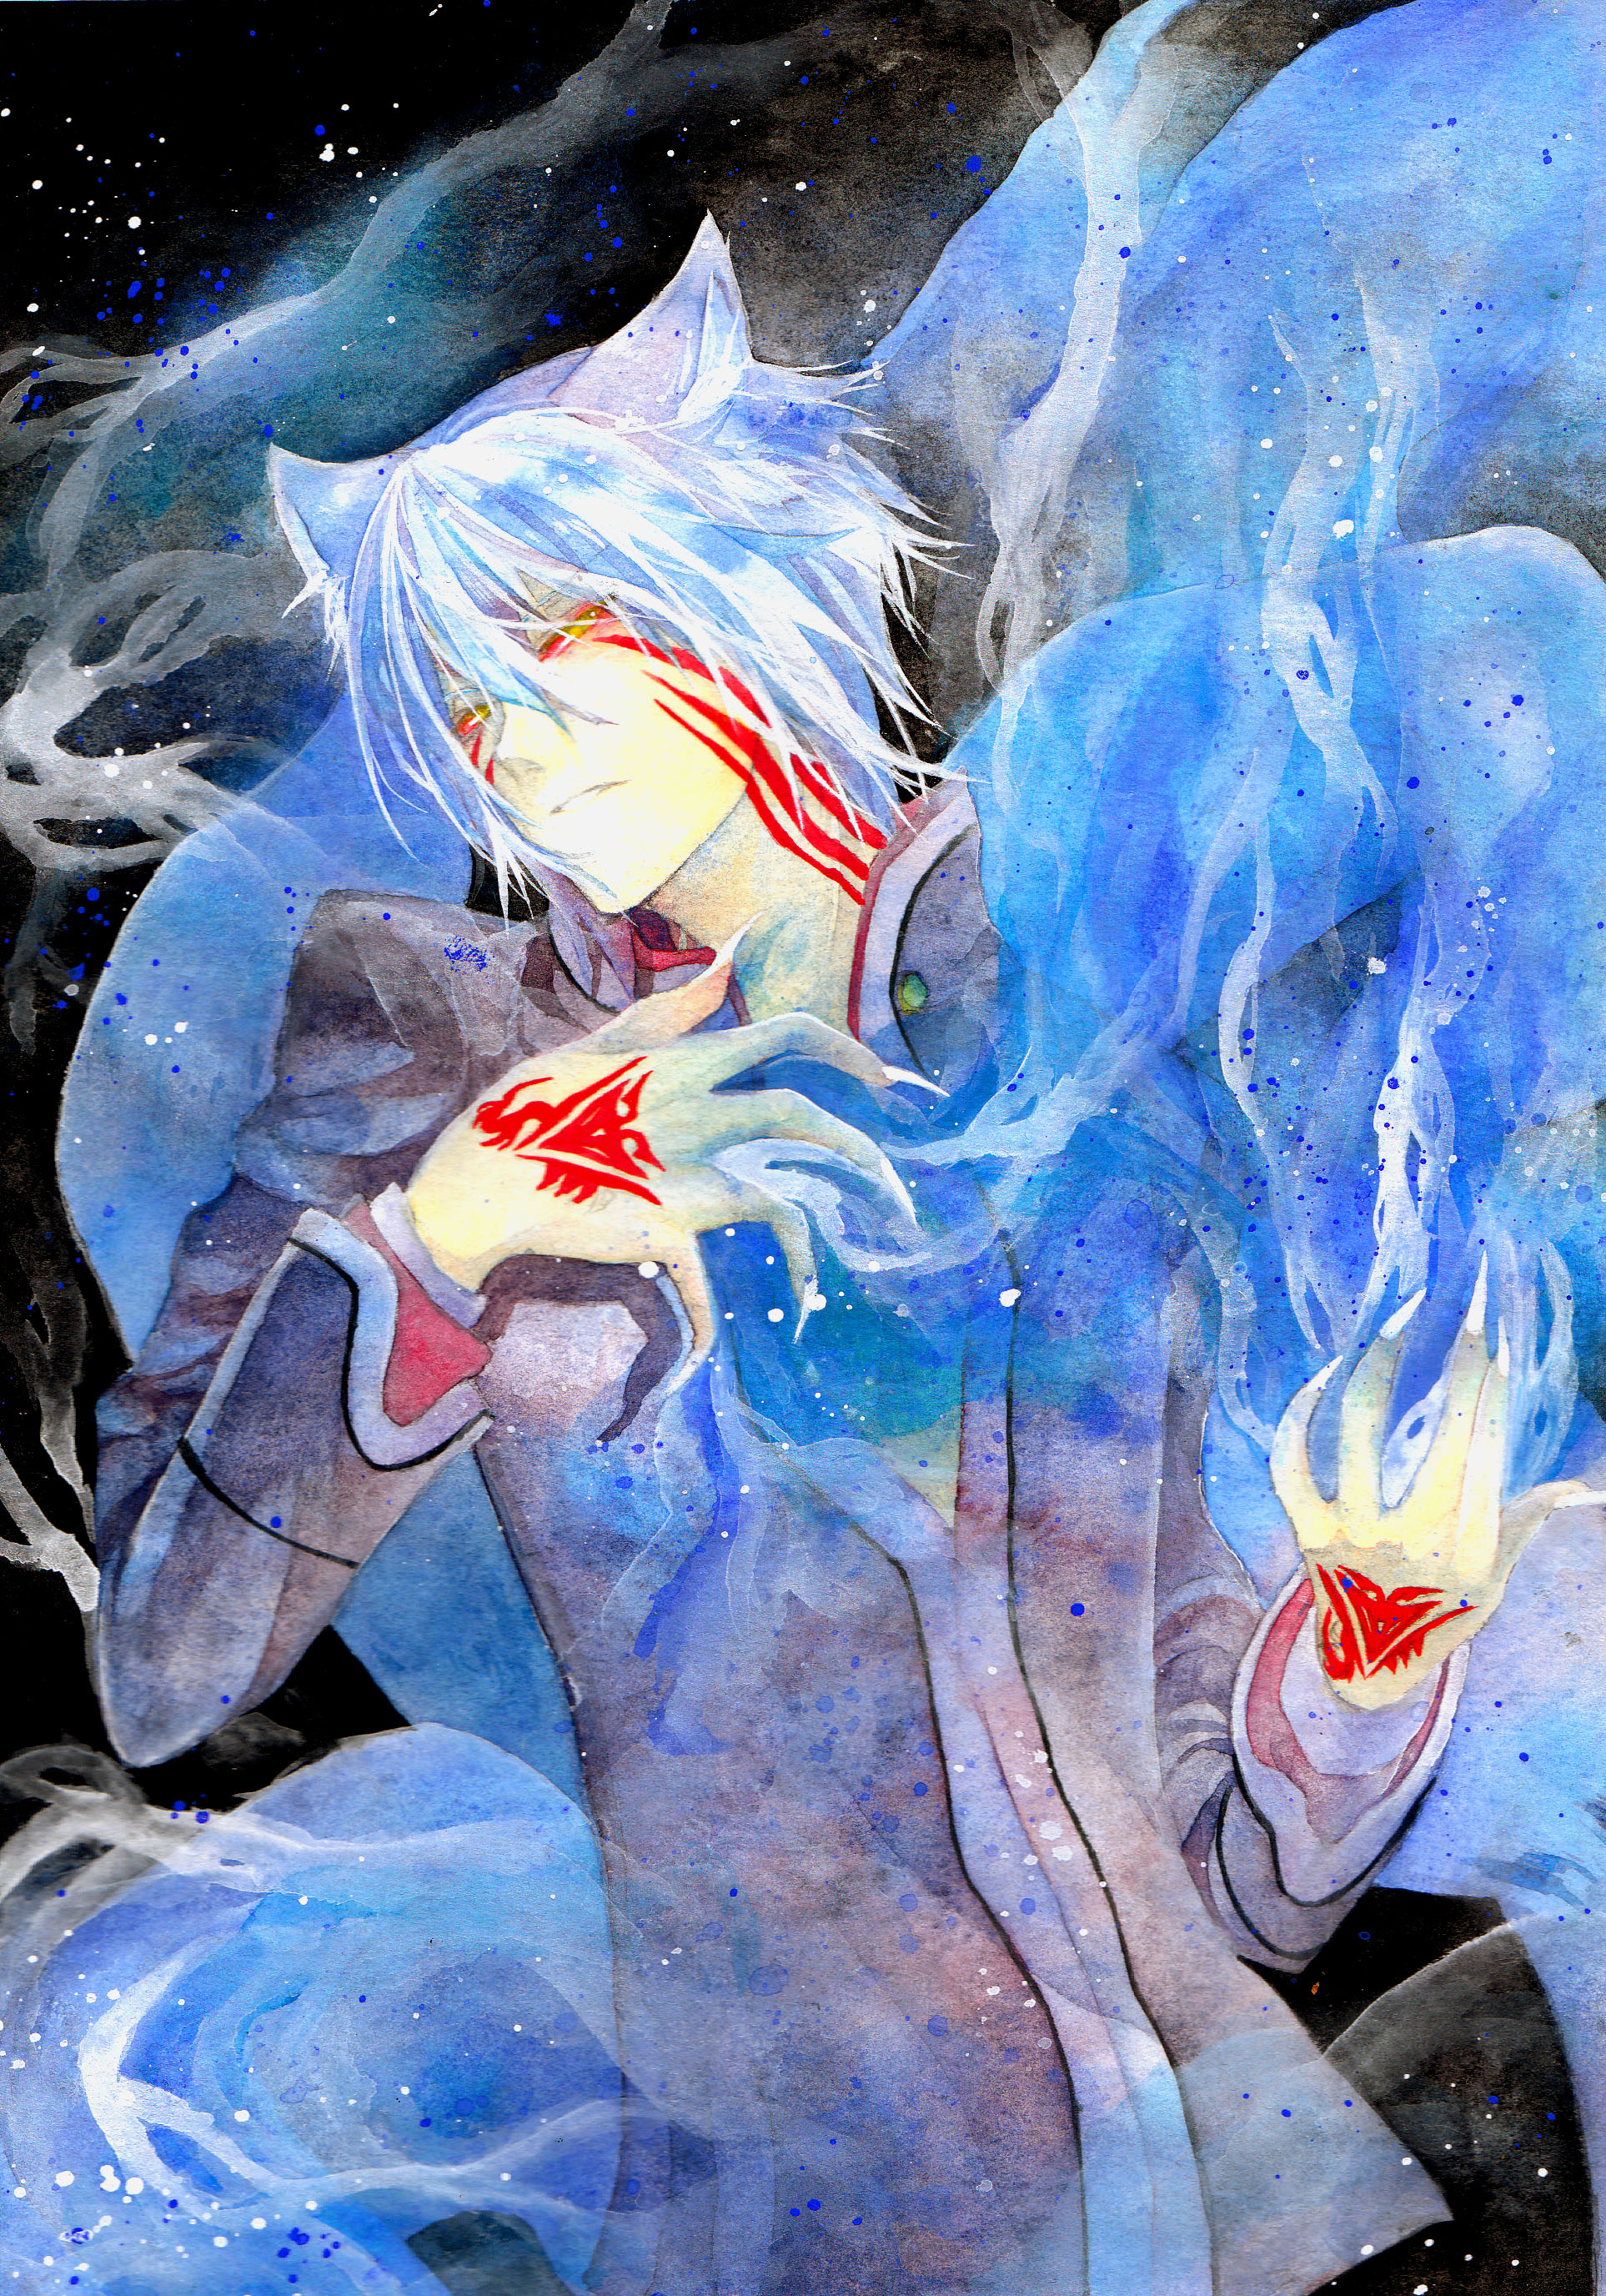 Hiiro no Kakera (Scarlet Fragments), Fanart - Zerochan ...